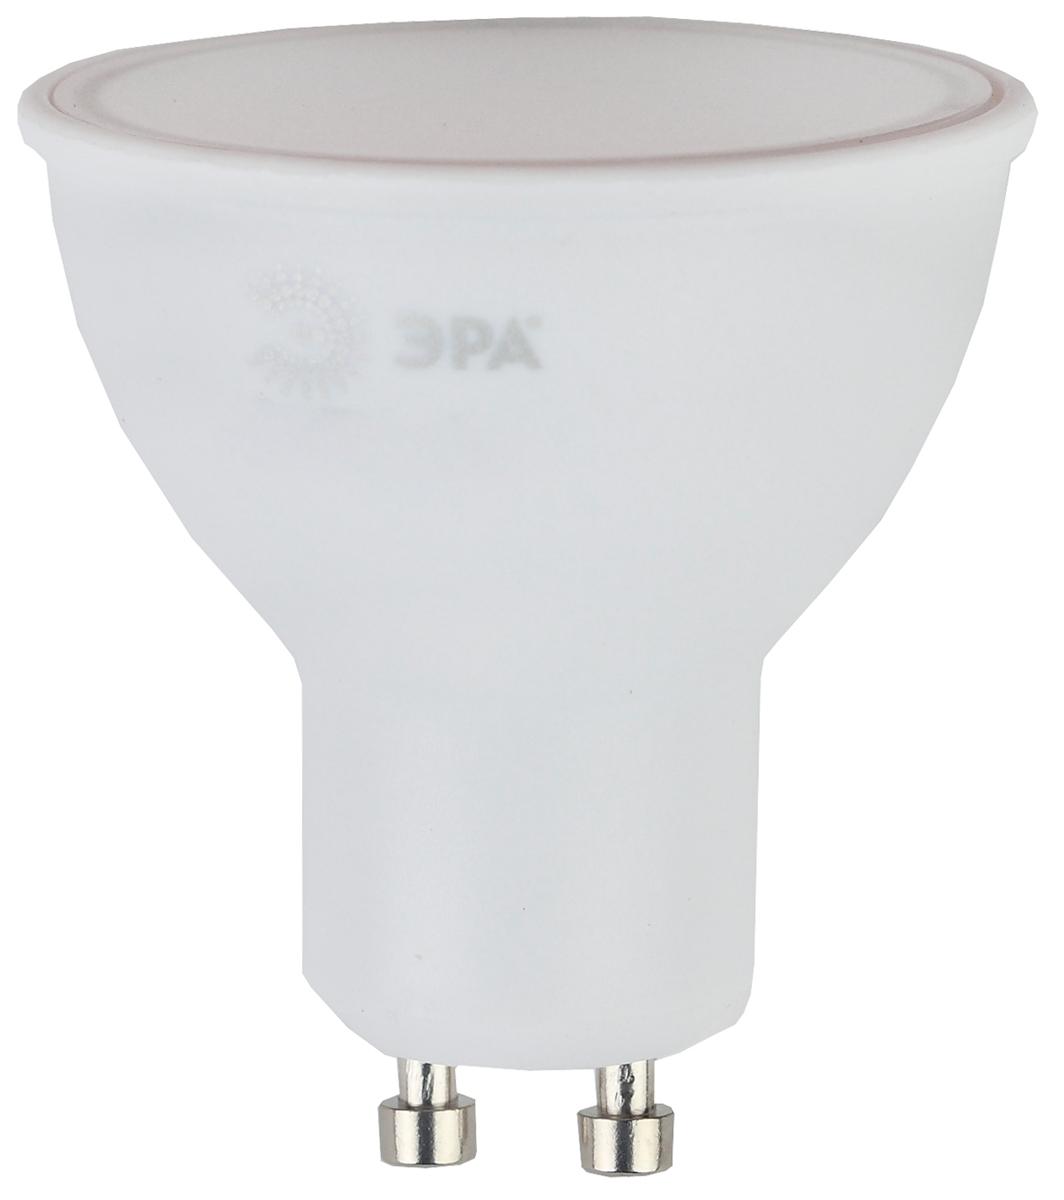 Лампа светодиодная ЭРА, цоколь GU10, 6W, 4000K. MR16-6w-840-GU10 лампа светодиодная маяк c30 e14 6w 4000k